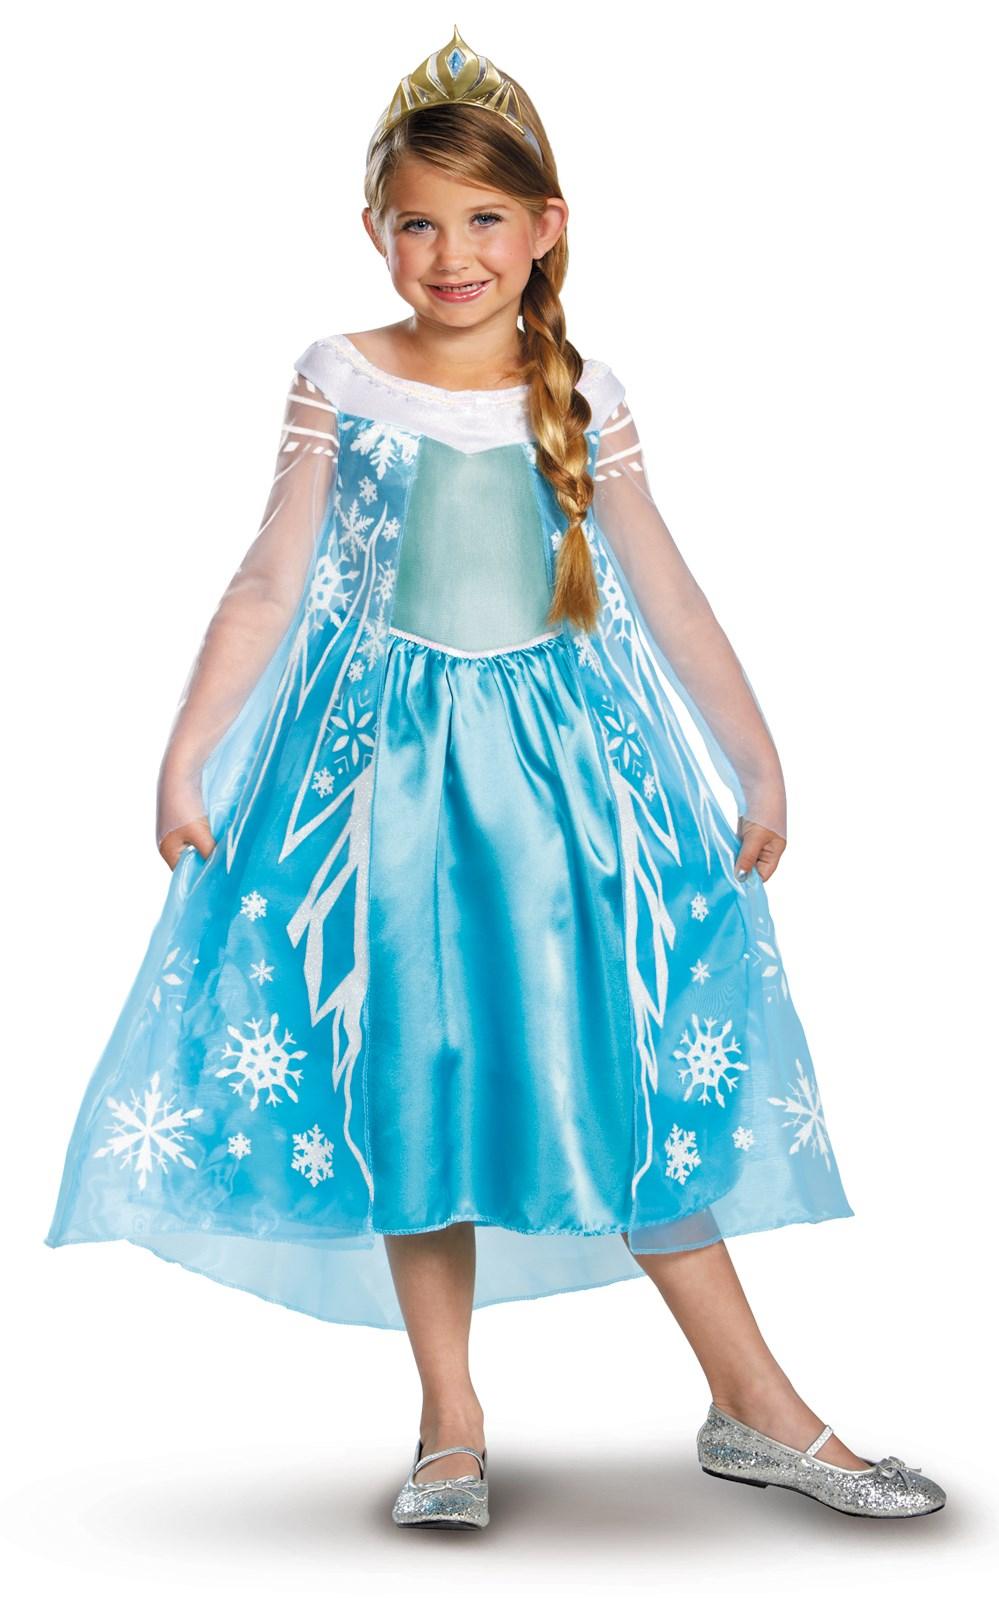 Disney Frozen Deluxe Elsa Toddler / Child Costume | BirthdayExpress.com